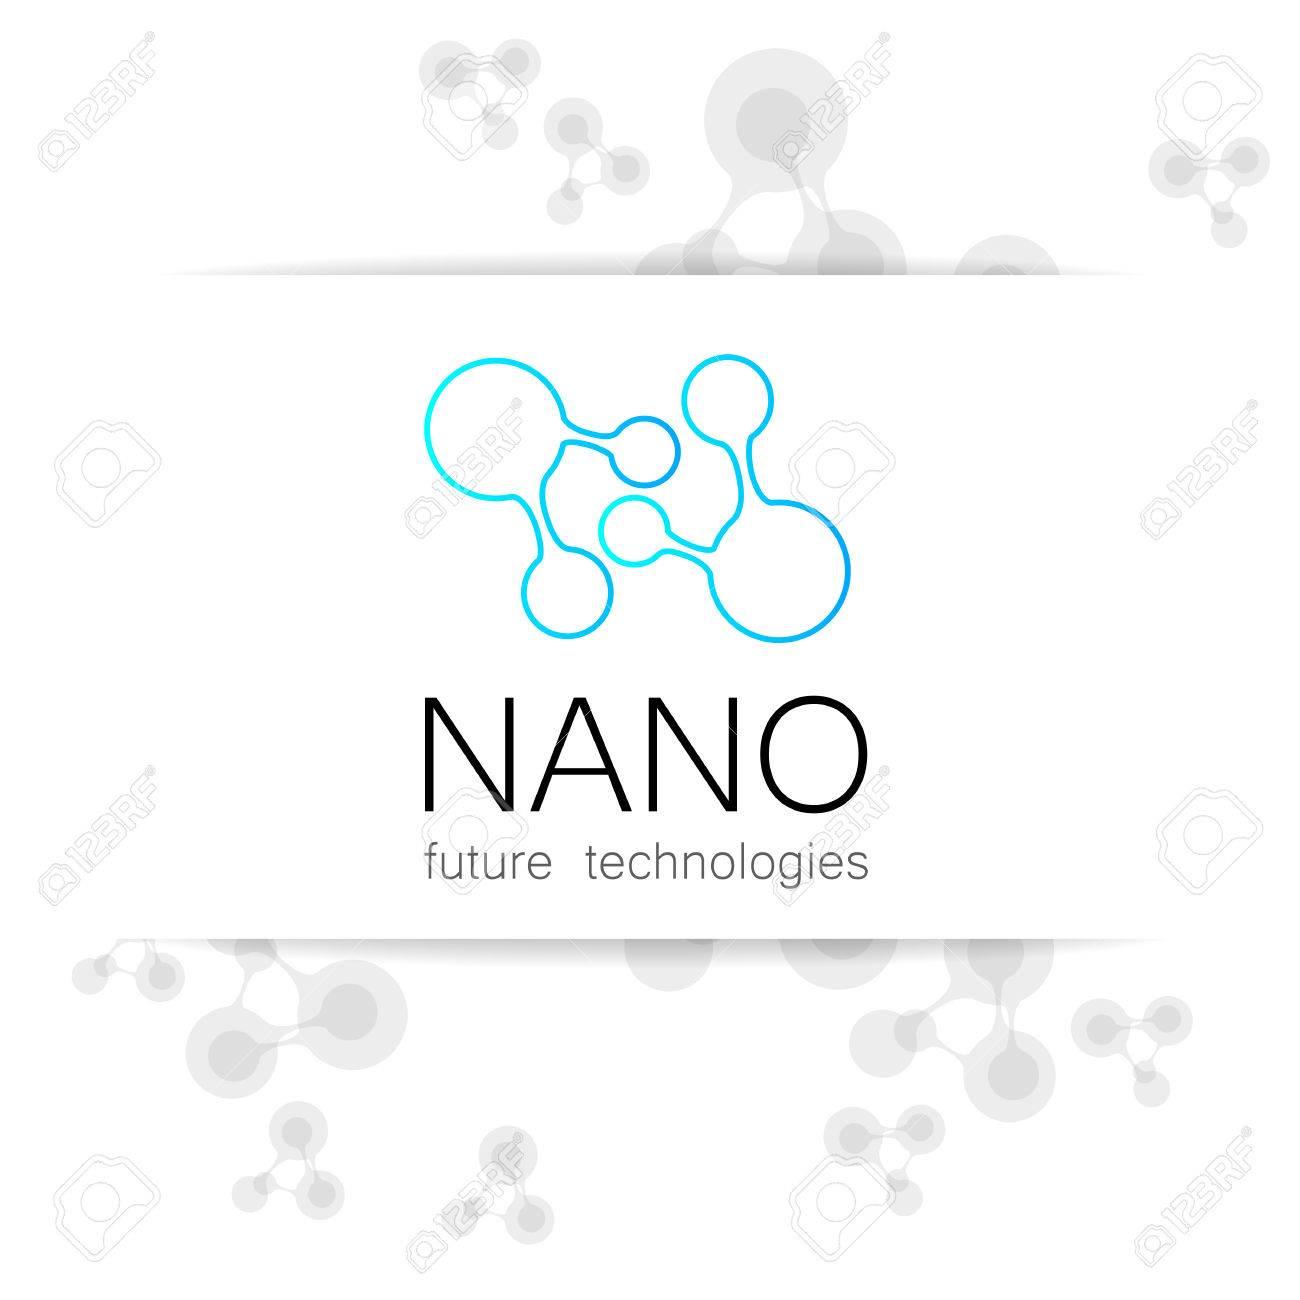 Nano - Nanotechnology. Template Design Presentation. Royalty Free ...